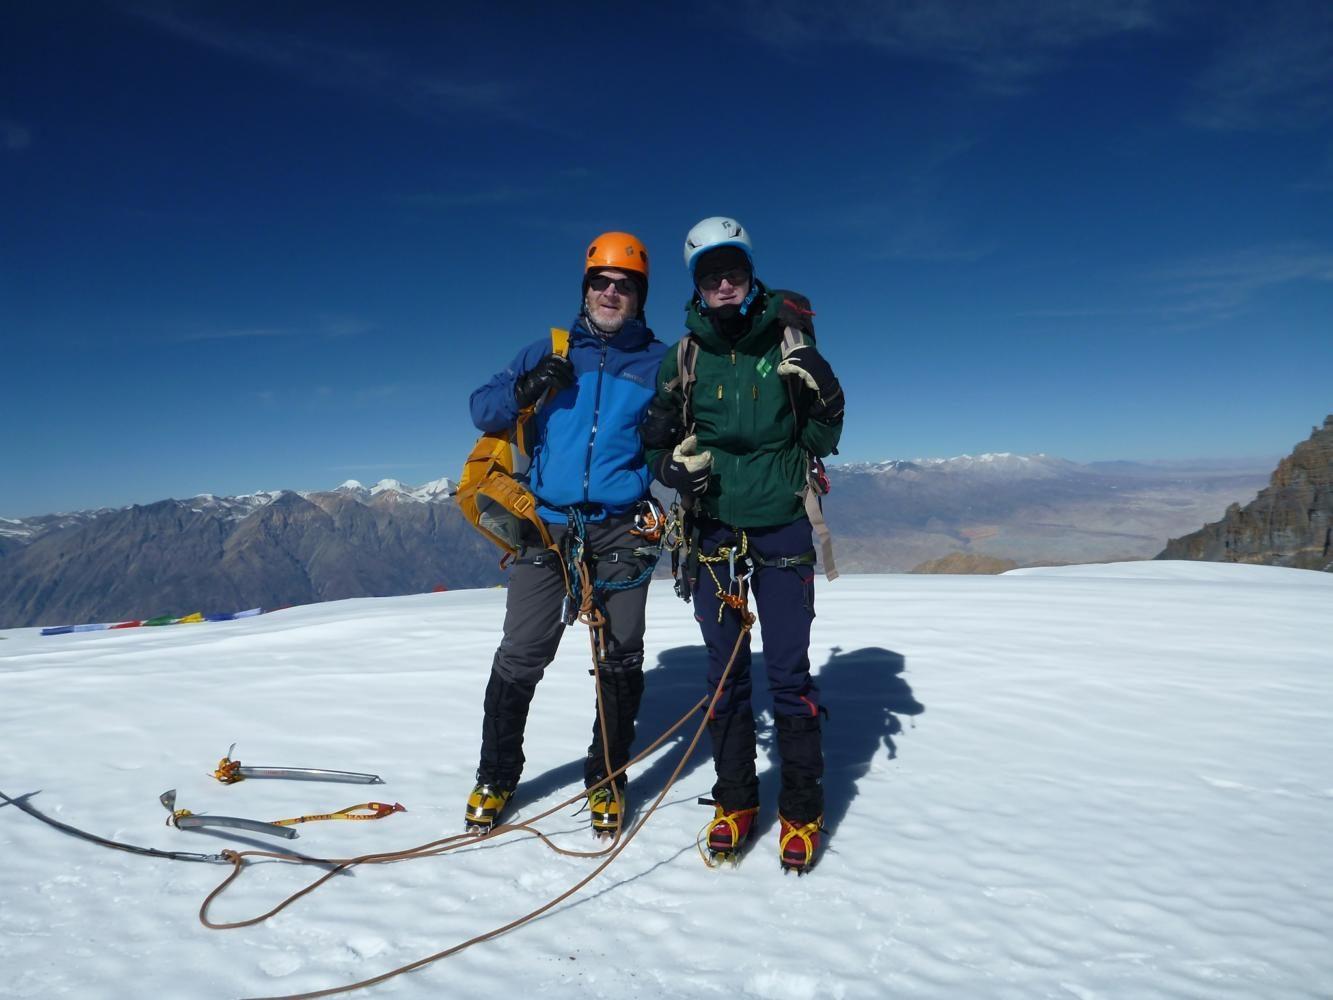 Christian+Whisenant+poses+with+his+father+Jonathon+Whisenant+while+trekking+in+Nepal.